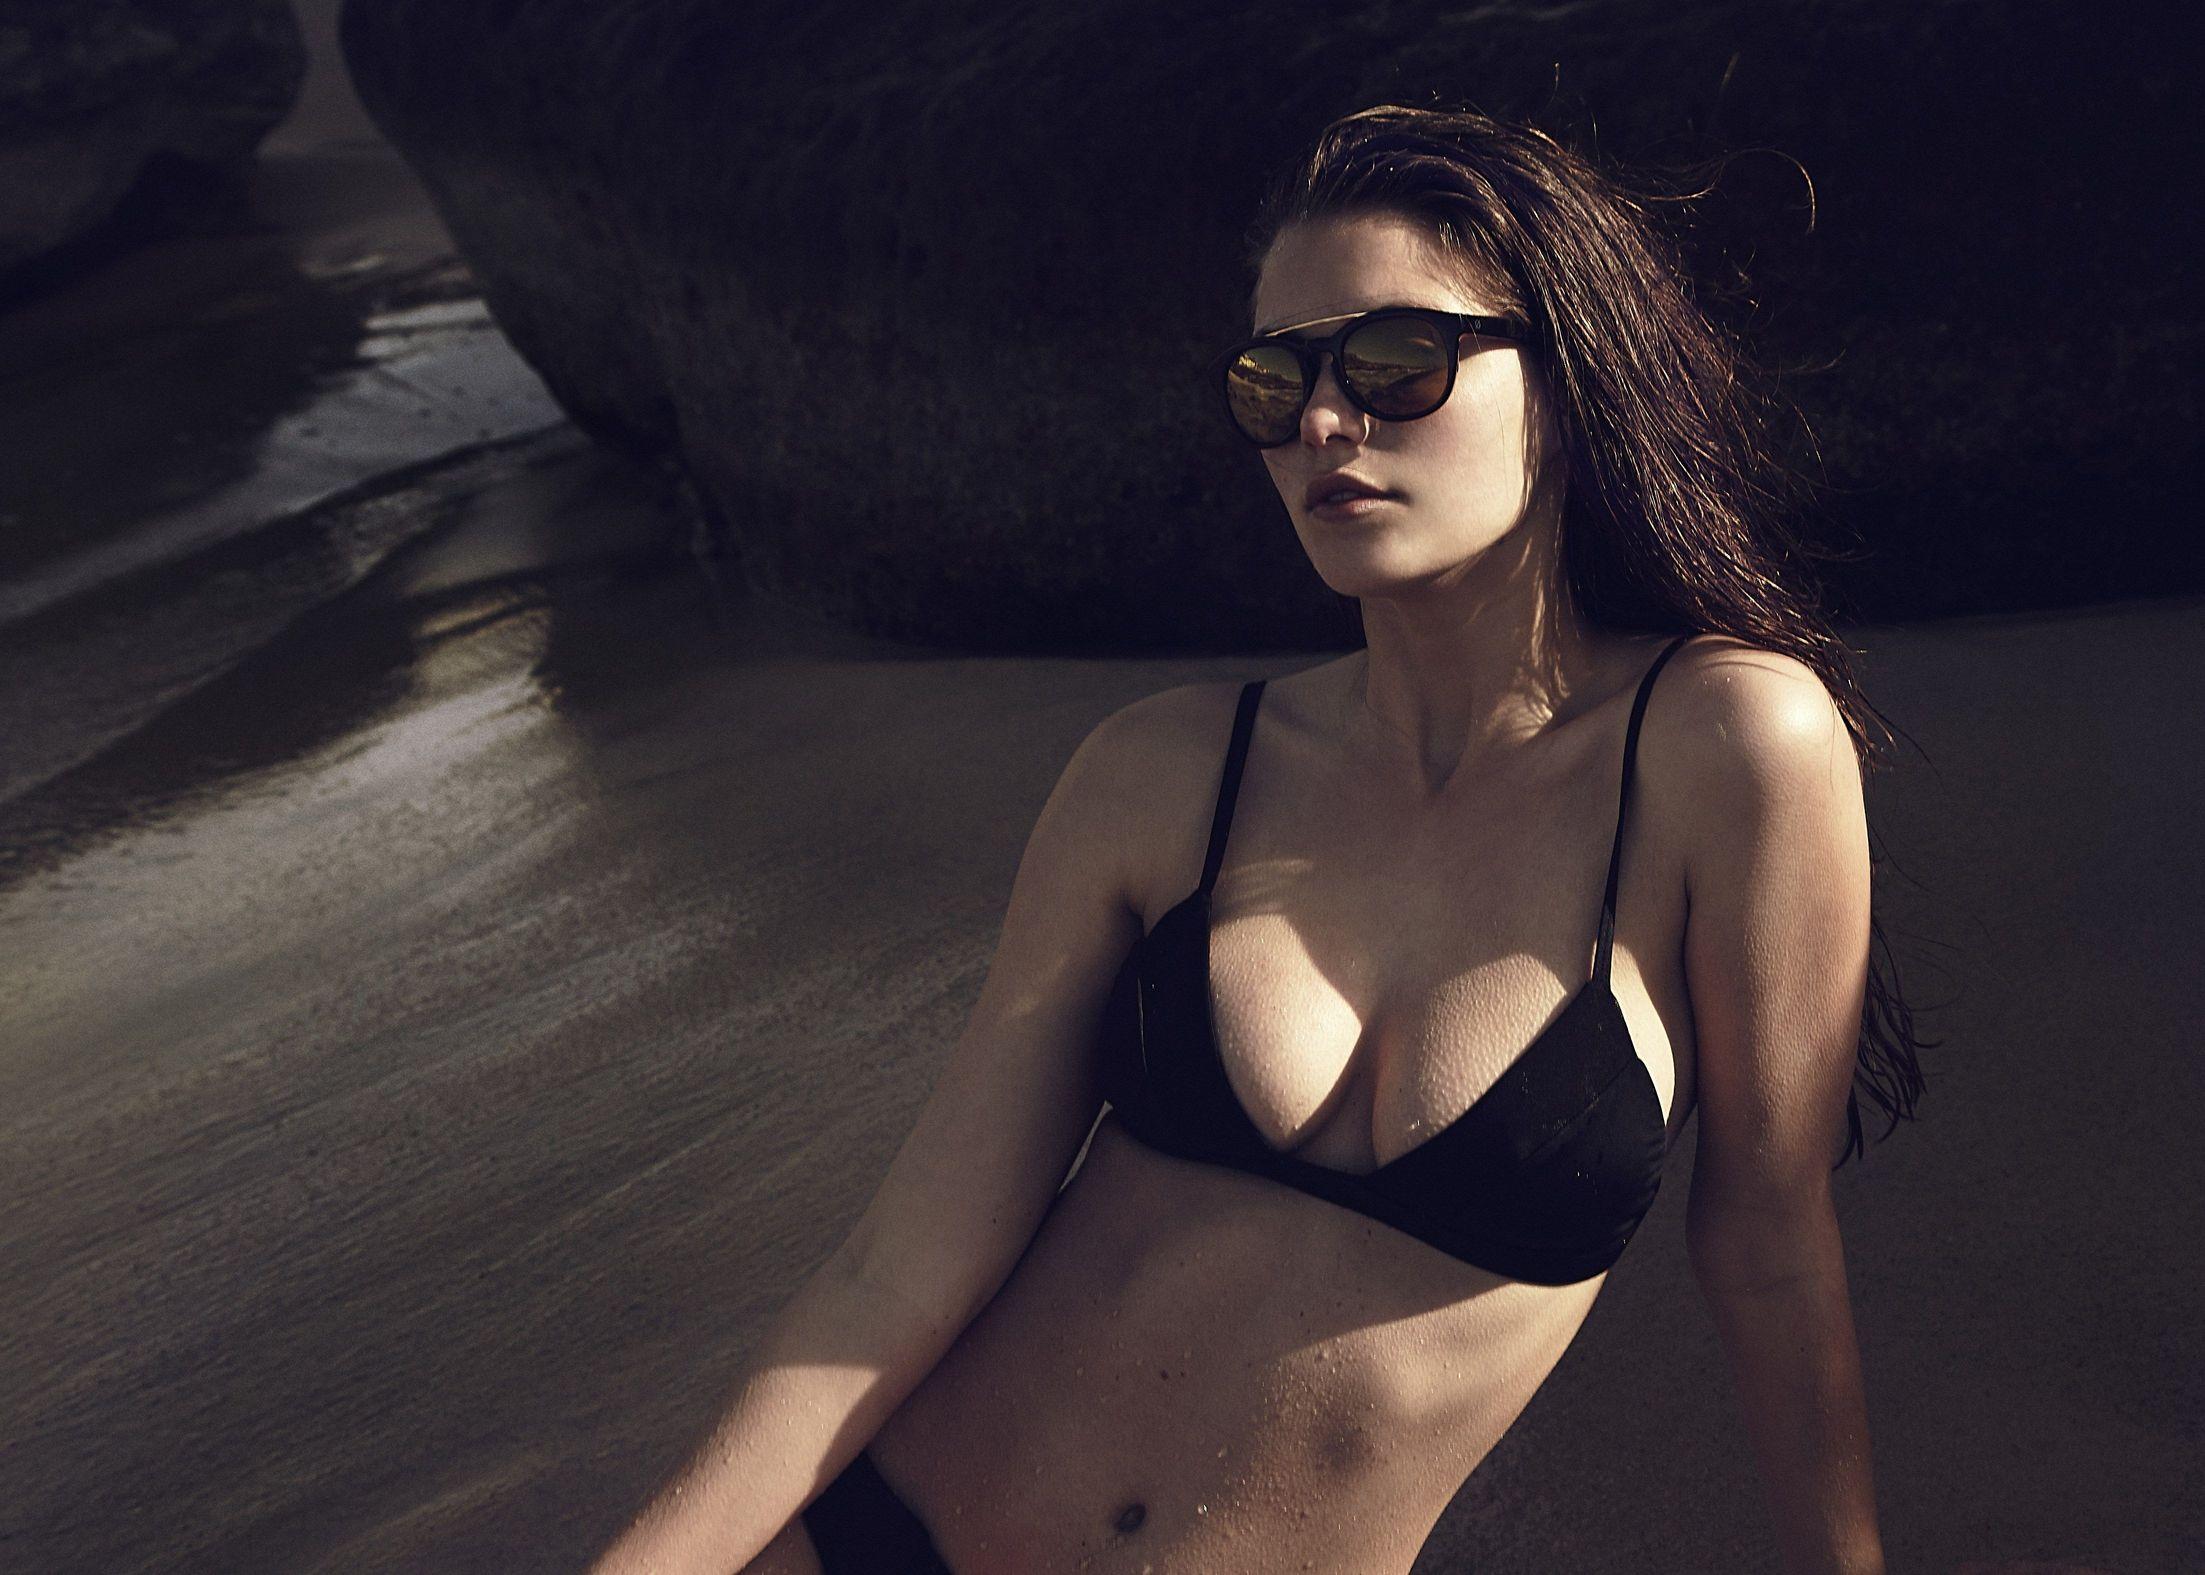 Porno Gigi Midgley nude photos 2019